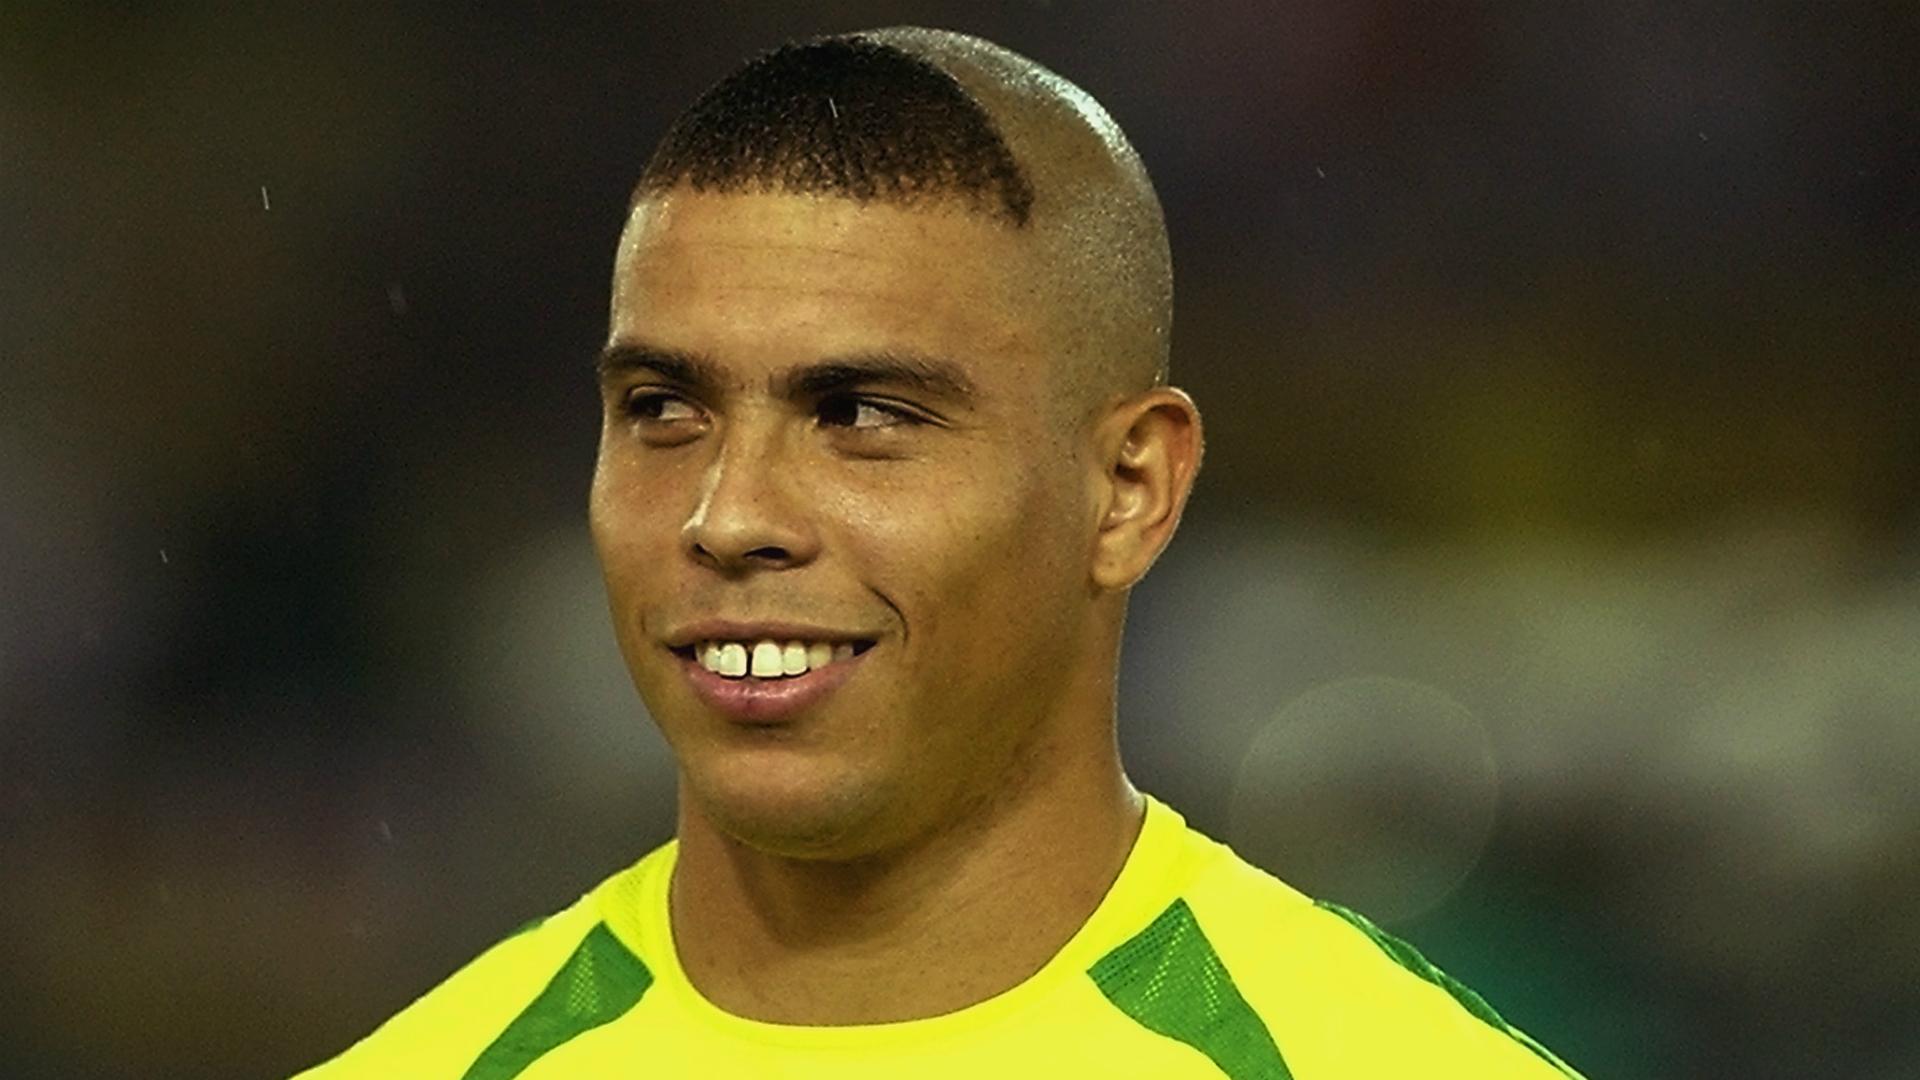 Ronaldo: Brazil legend reveals reason behind famous 2002 World Cup ...